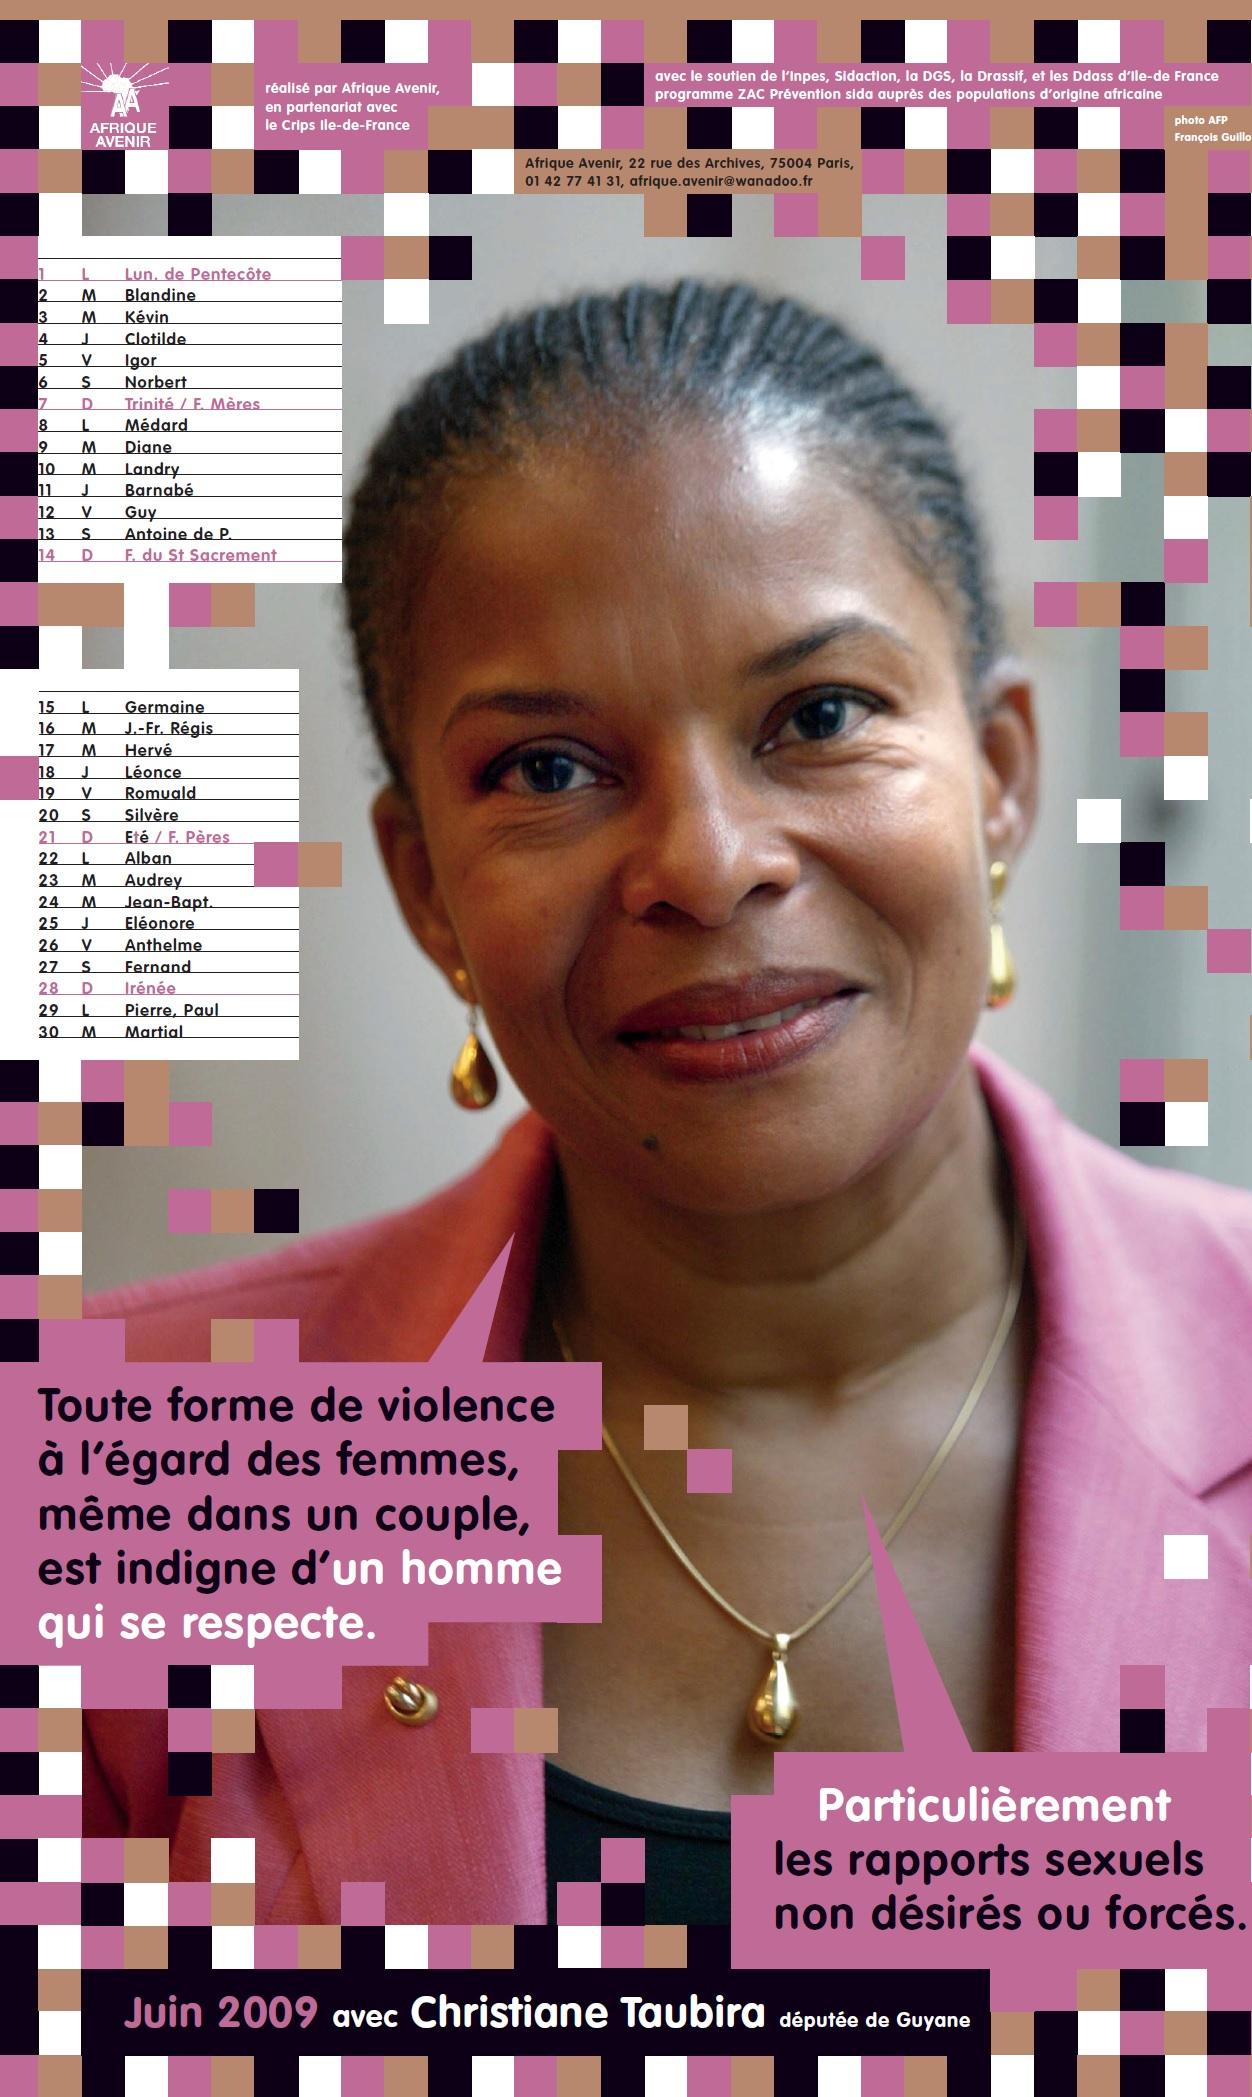 Contre le VIH/SIDA avec Christiane TAUBIRA